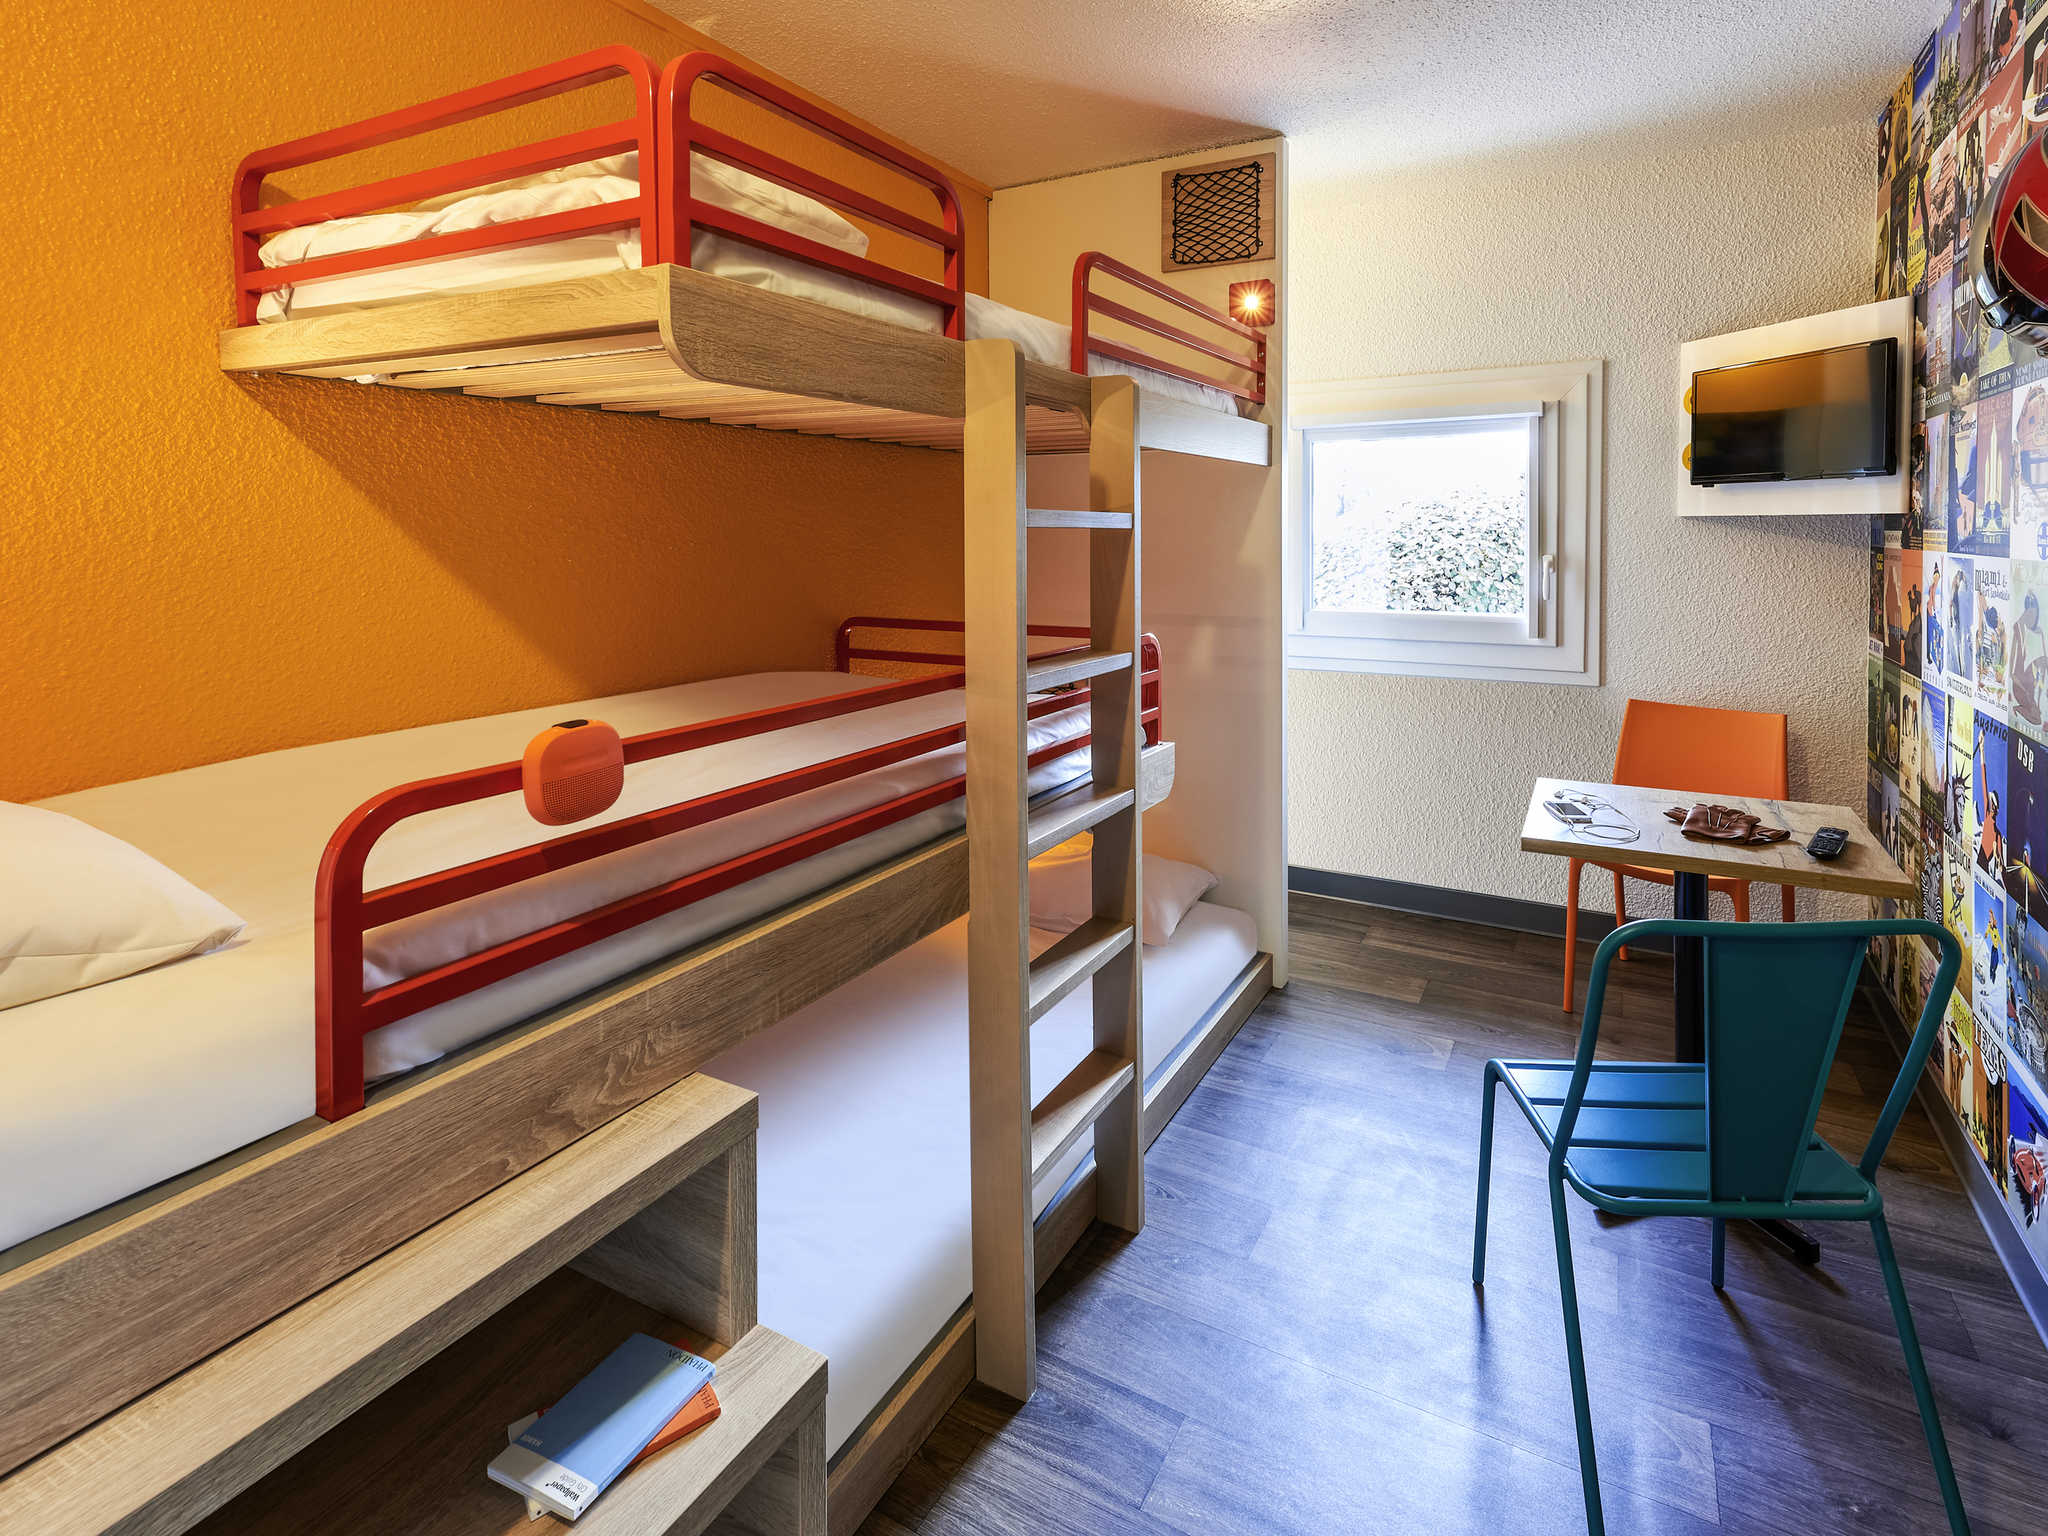 Hotel in BAGNOLET hotelF1 Paris Porte de Montreuil